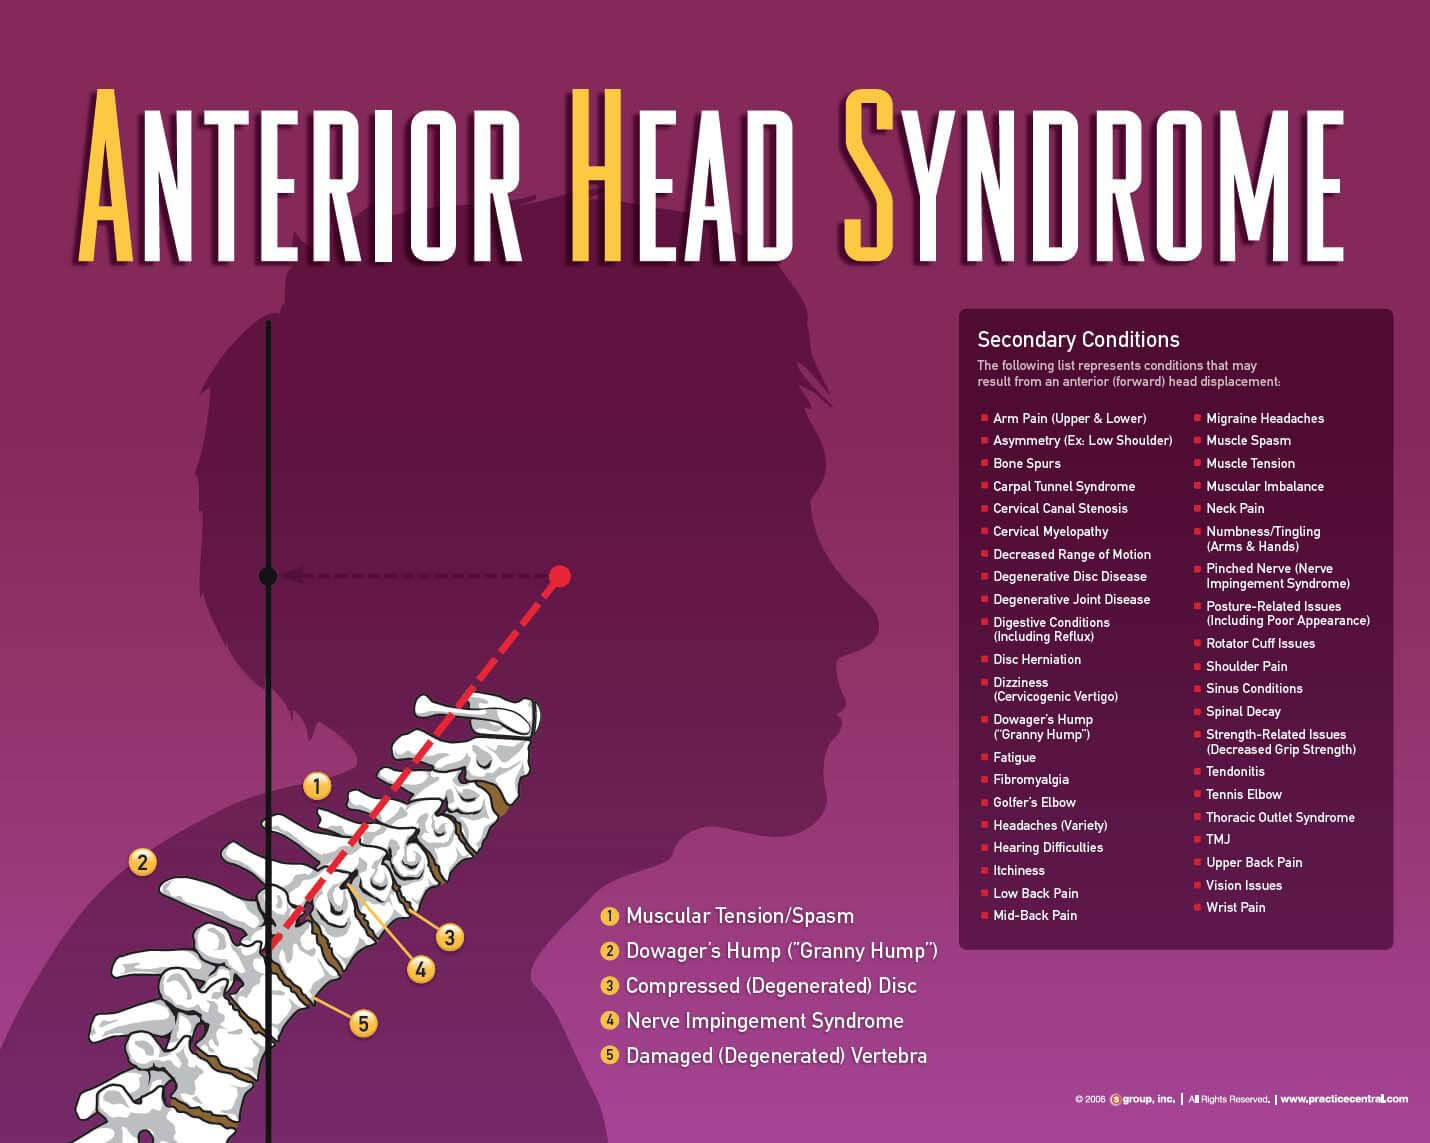 Anterior Head Syndrome